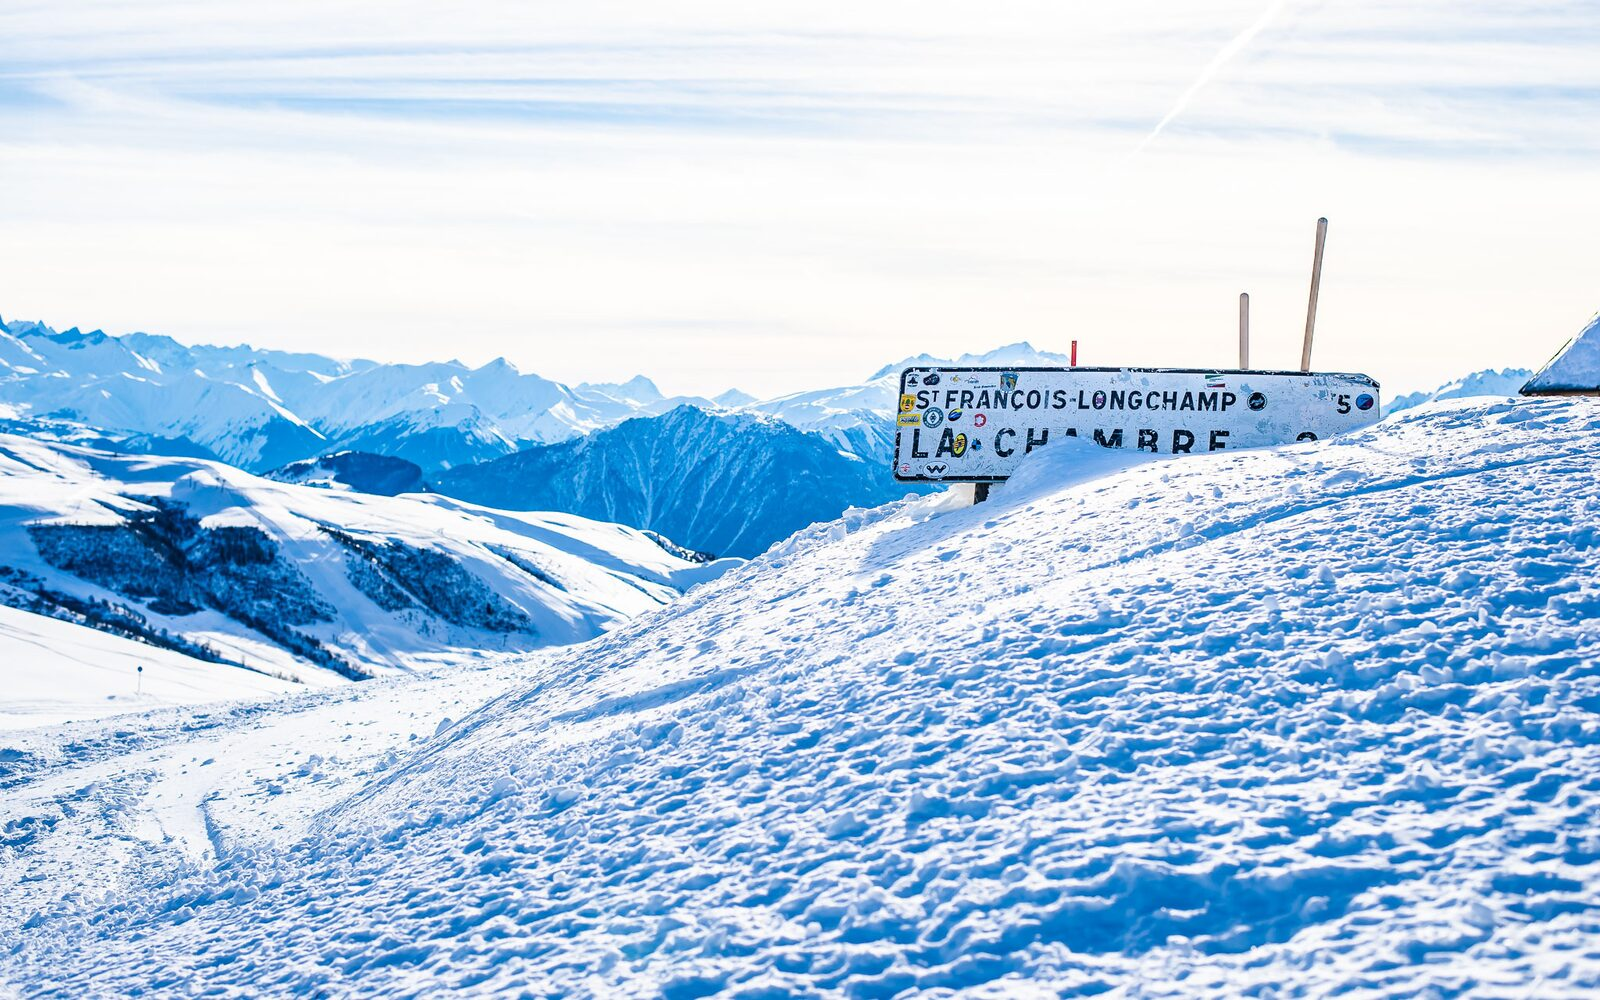 Ski passes 6 days High season + discount!